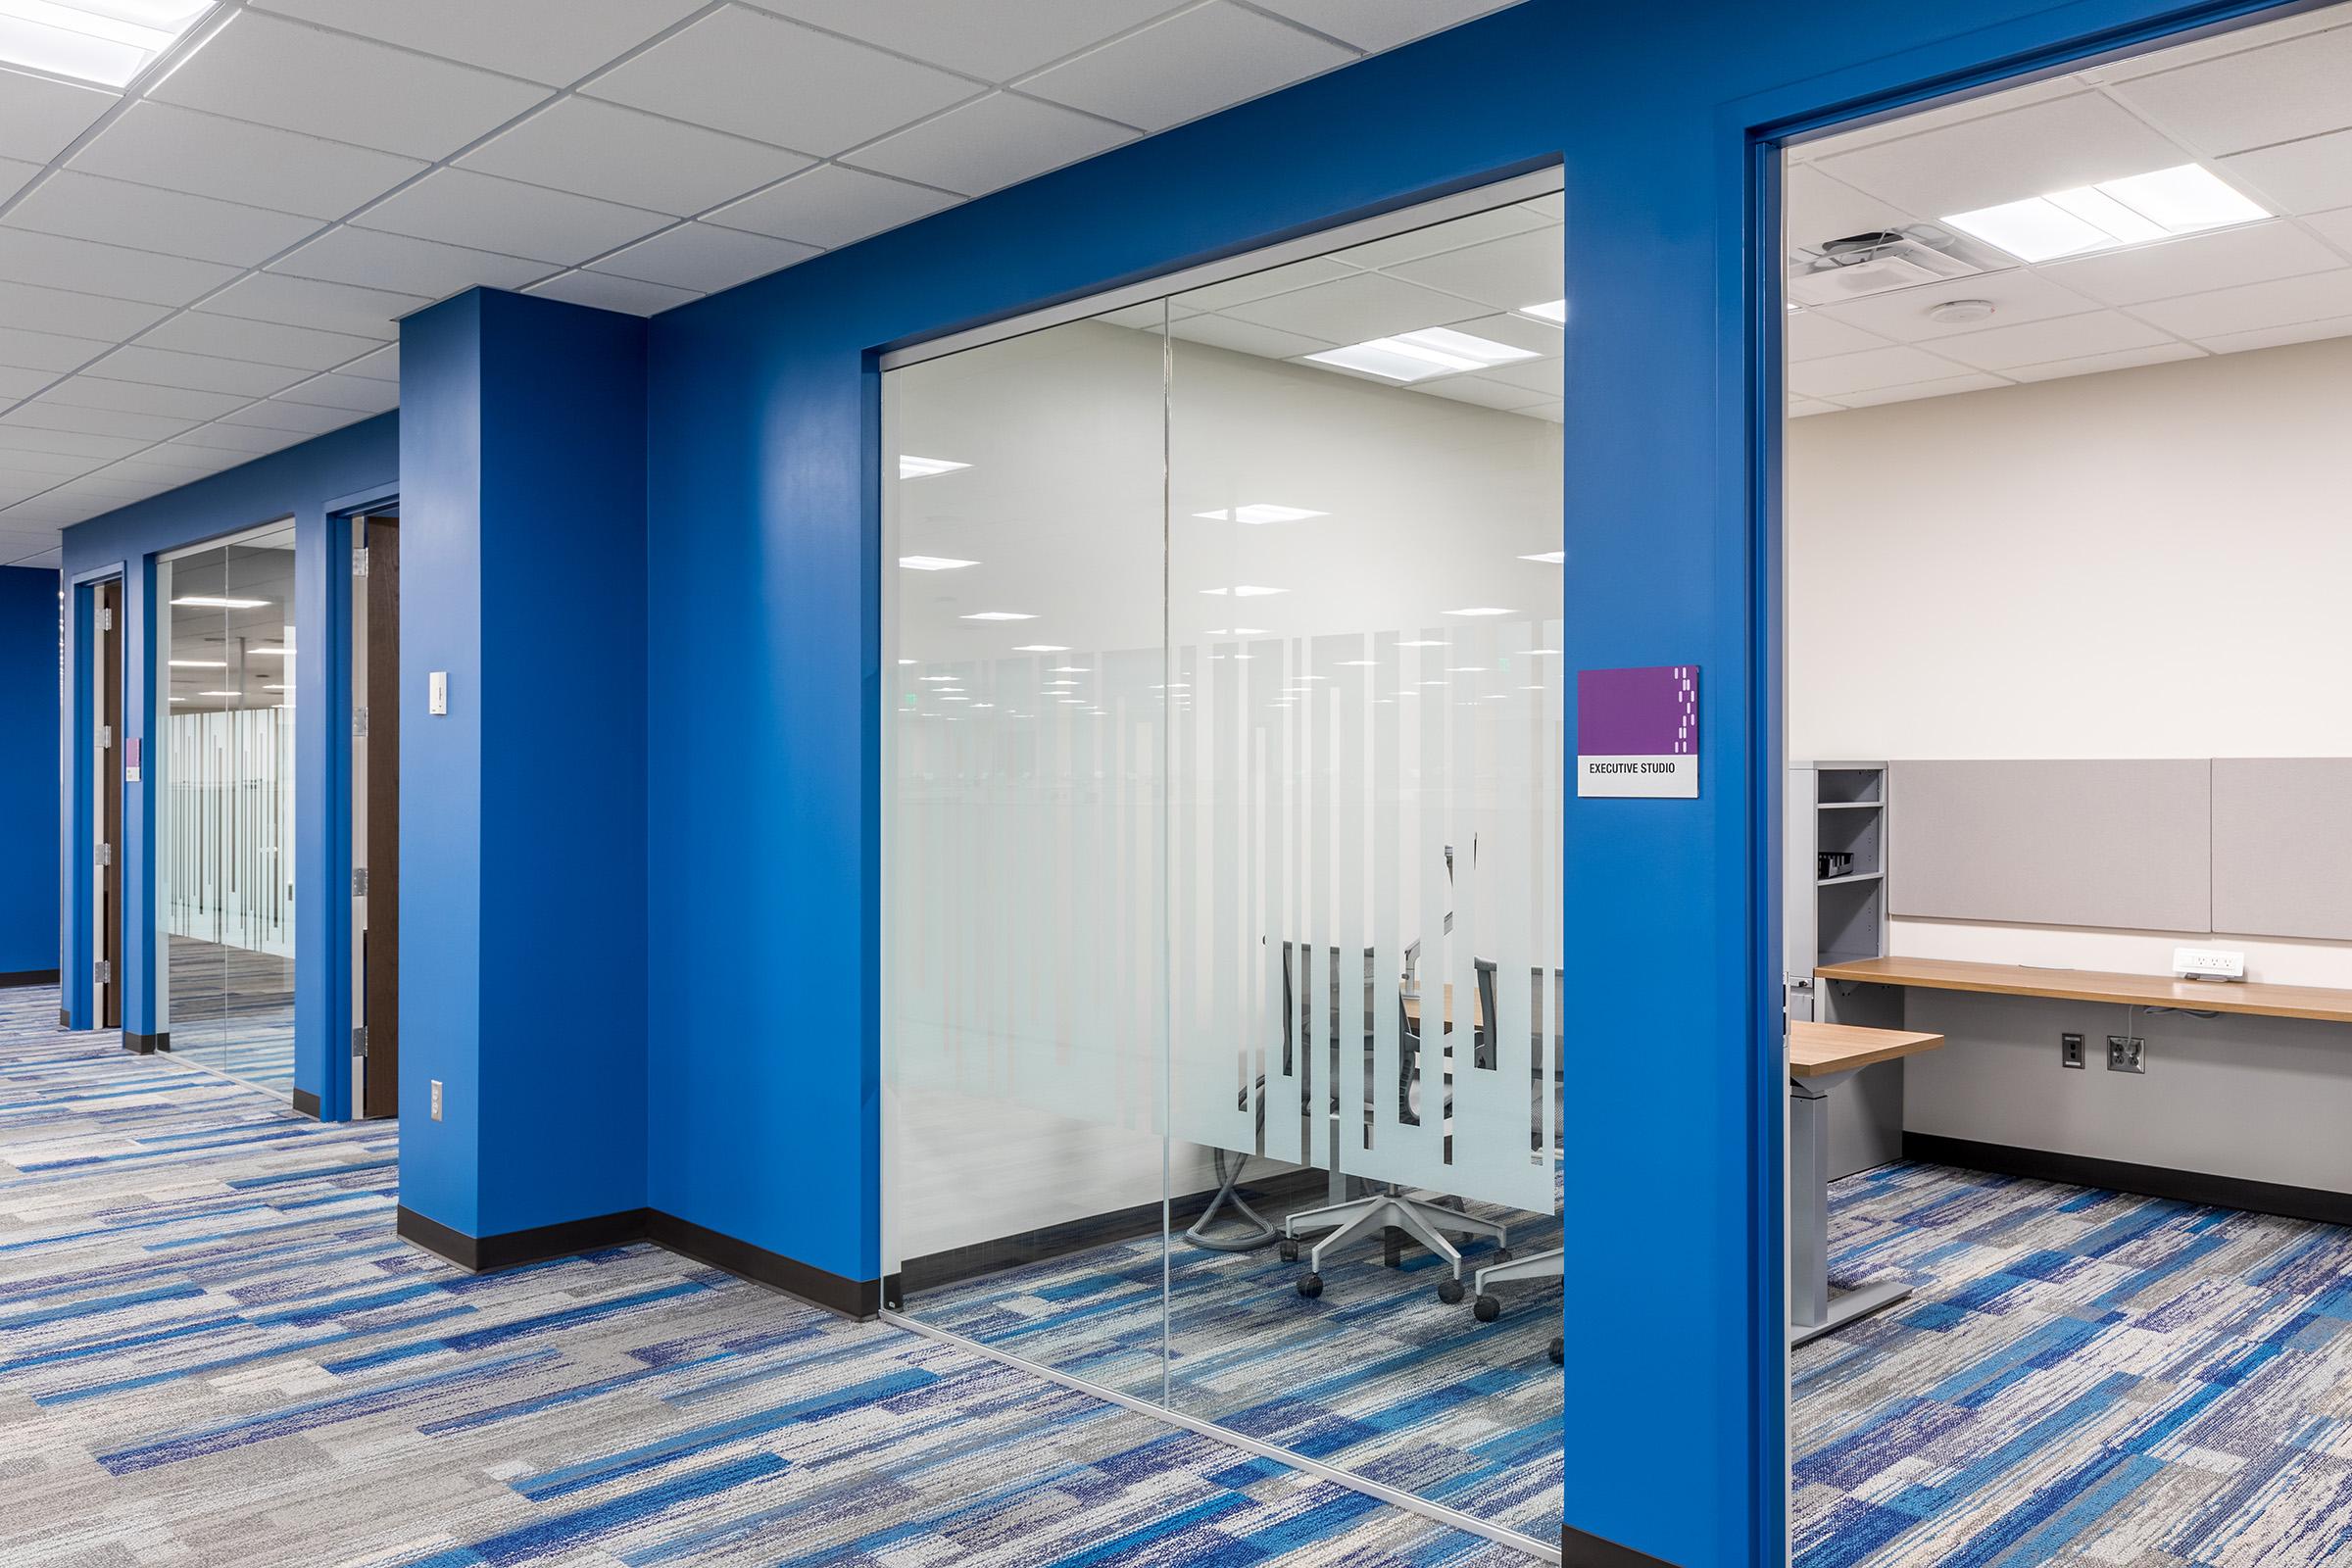 Cerner Office Building - Kelly Construction Group Kansas City